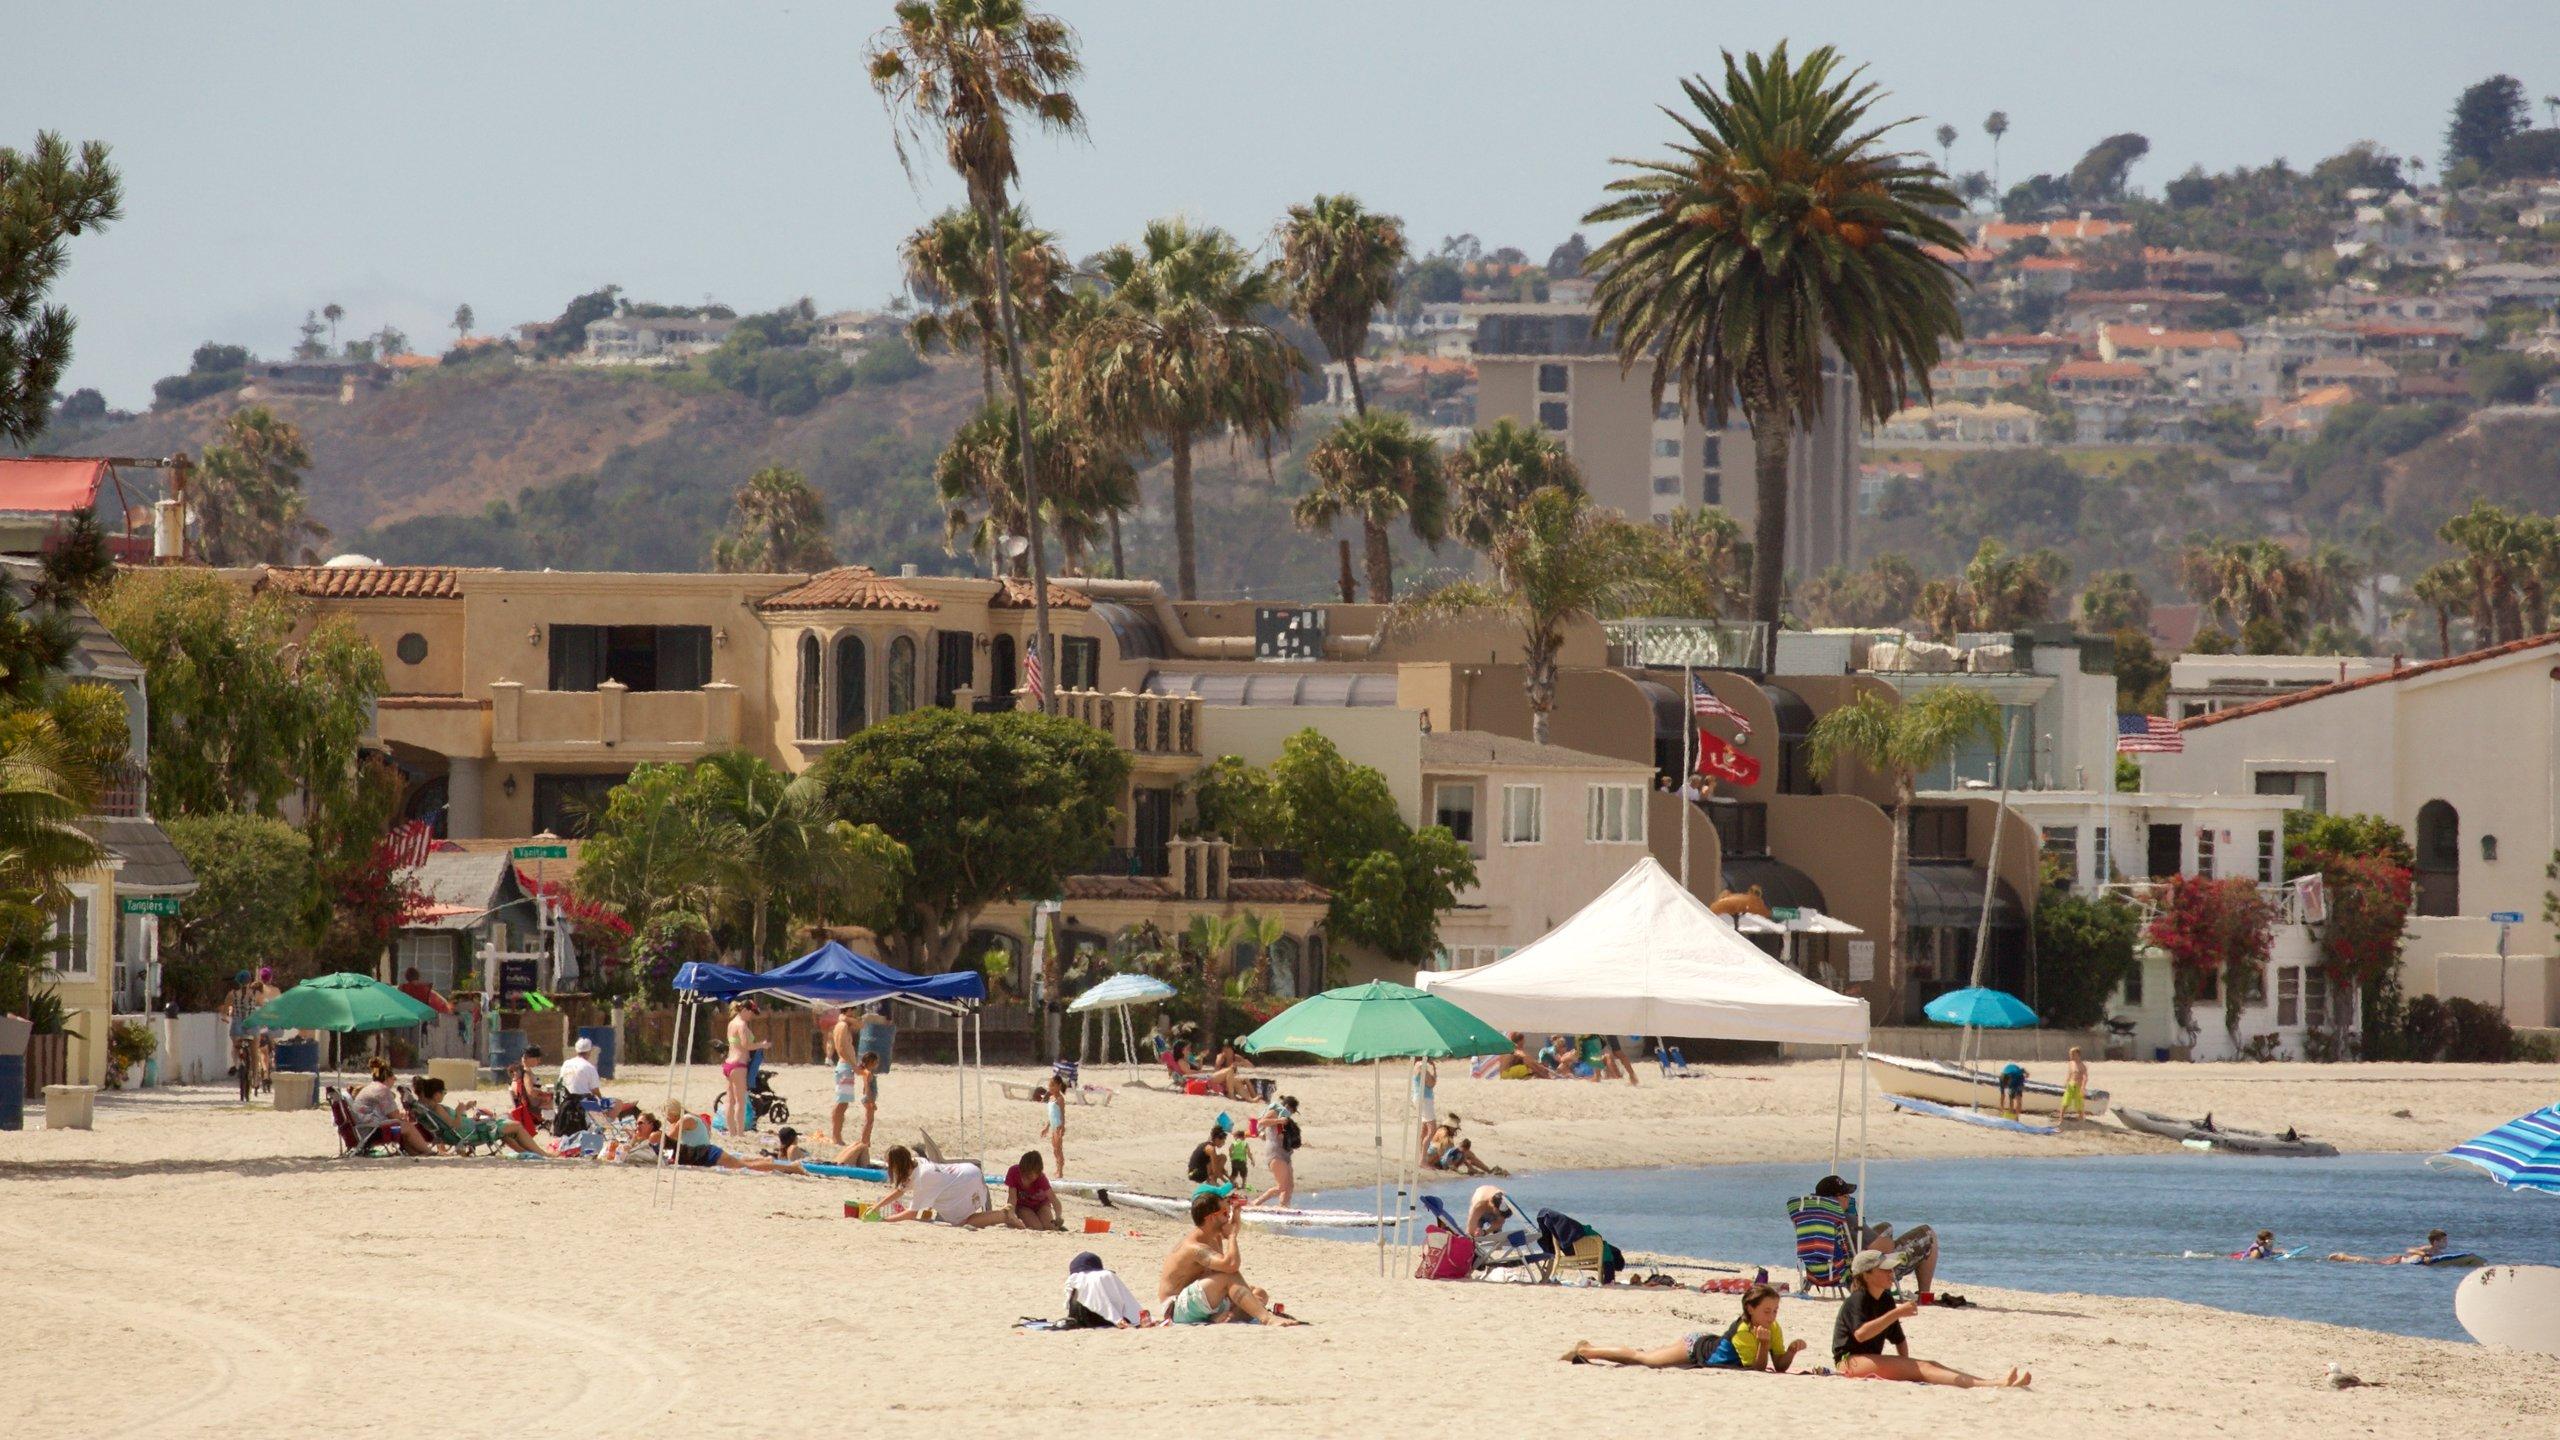 Mission Bay, San Diego, California, Stati Uniti d'America